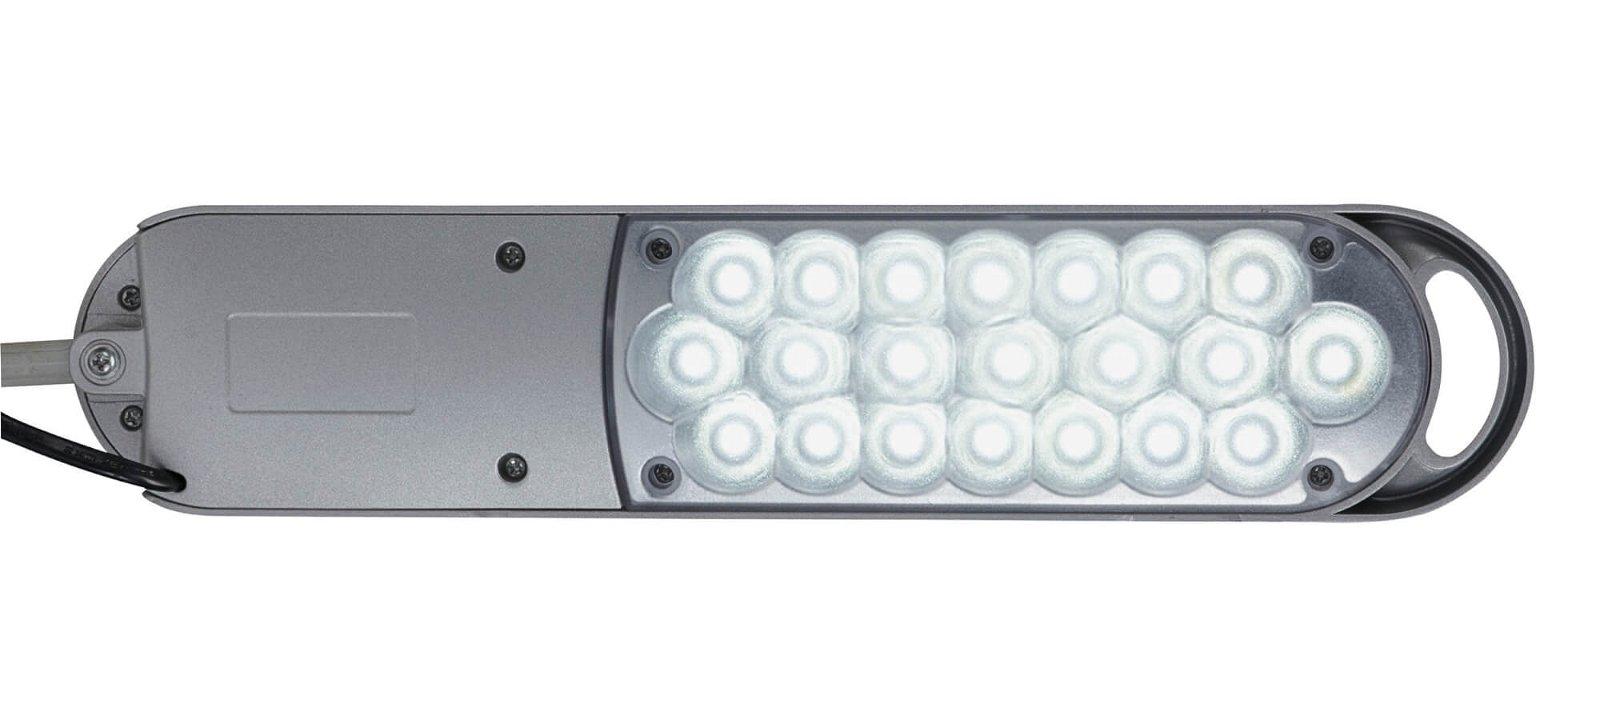 LED-Tischleuchte MAULatlantic, mit Klemmfuß, silber